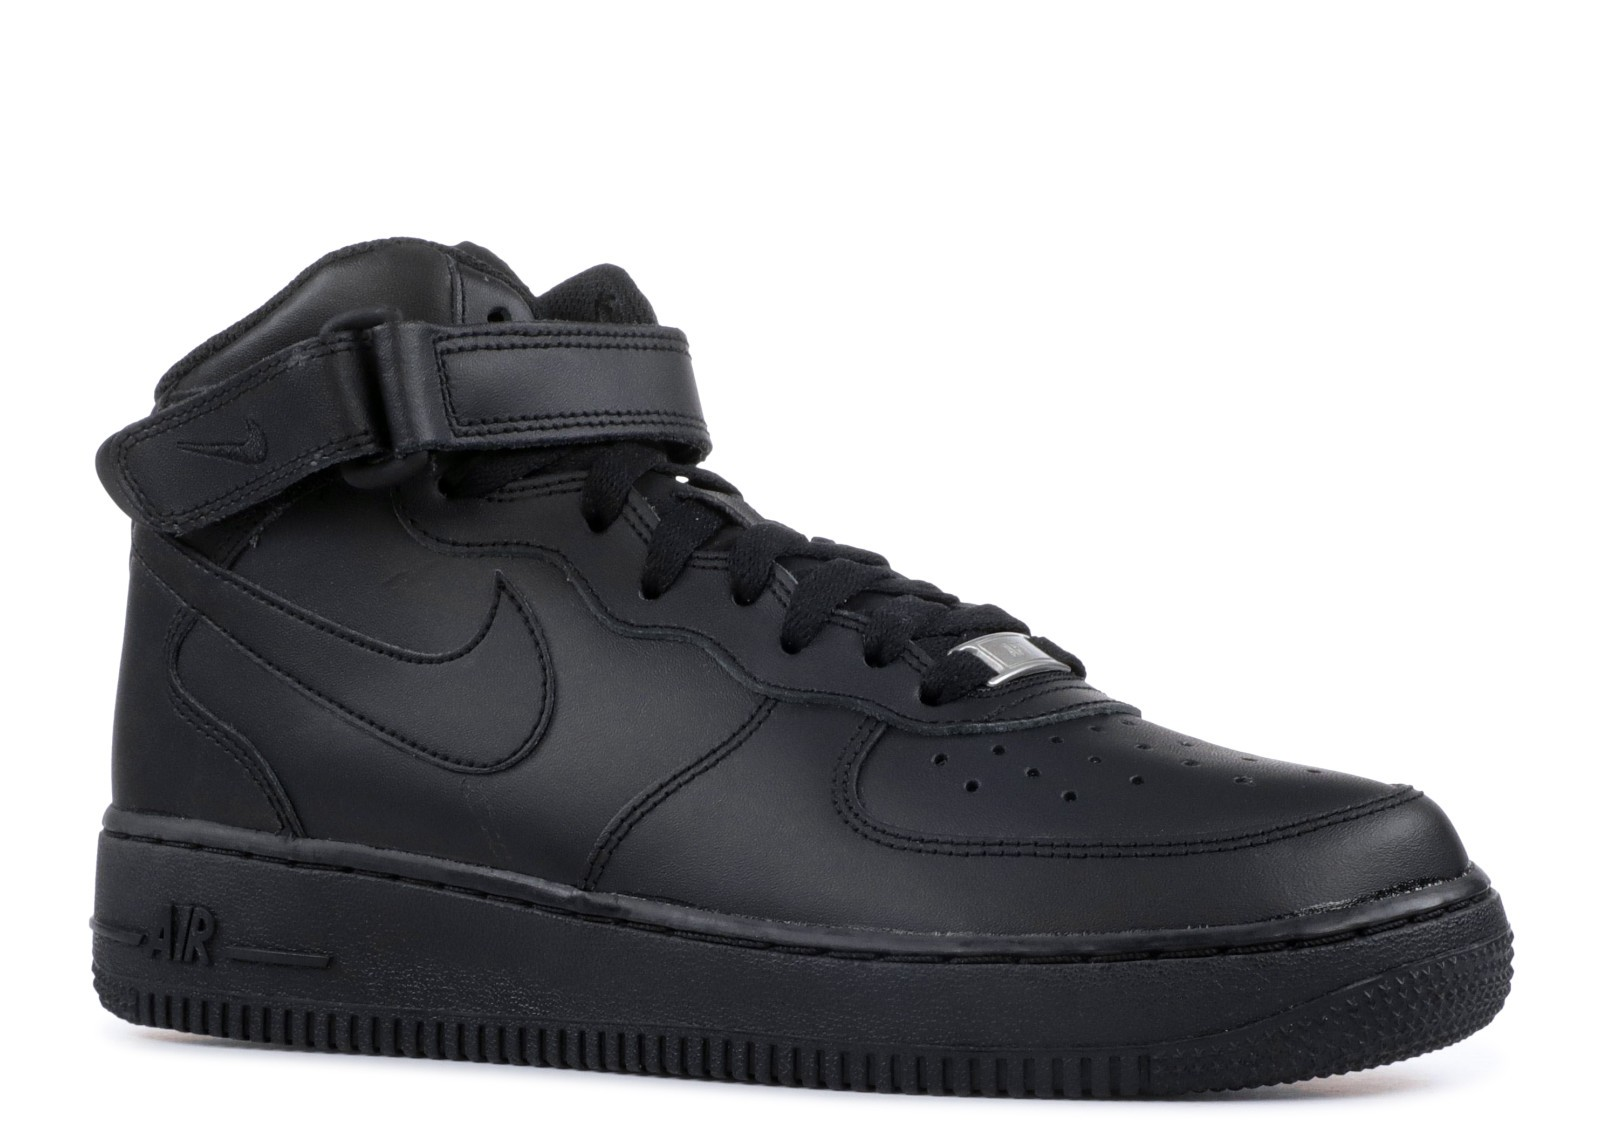 Nike Air Force 1 Mid GS Big Kids